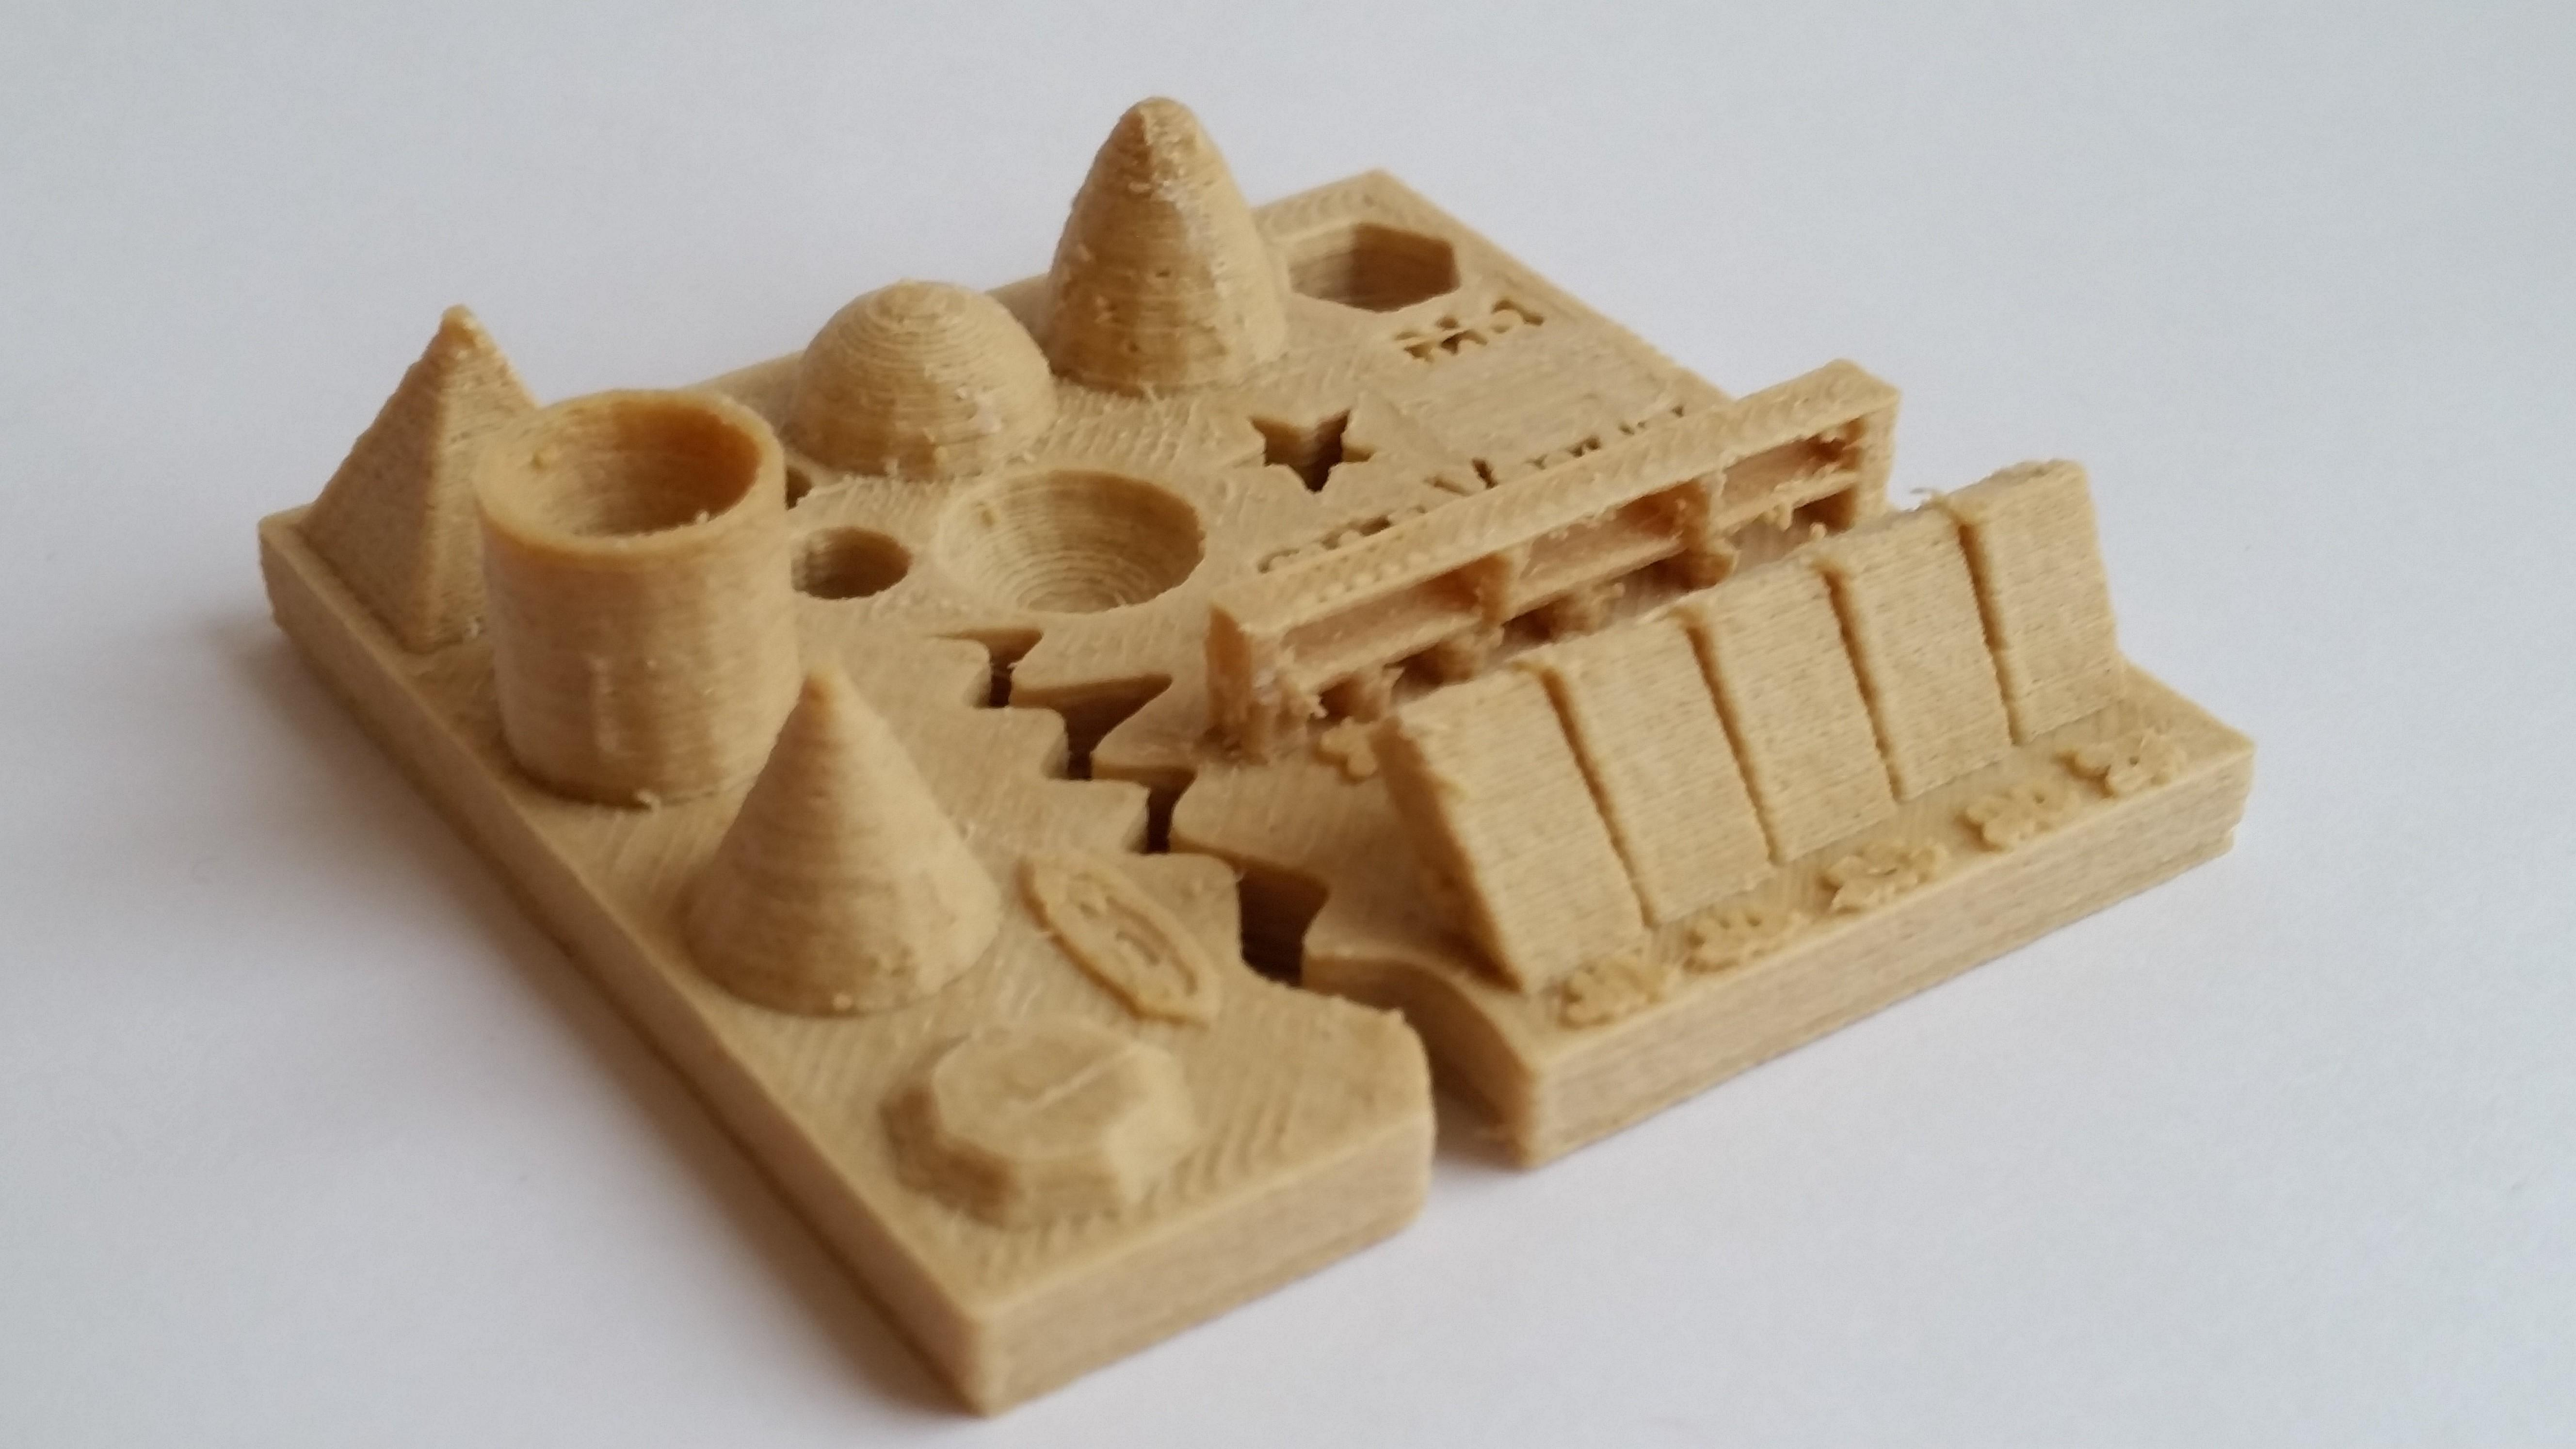 3D Printing Test - Resolving Stringing, Cura Settings